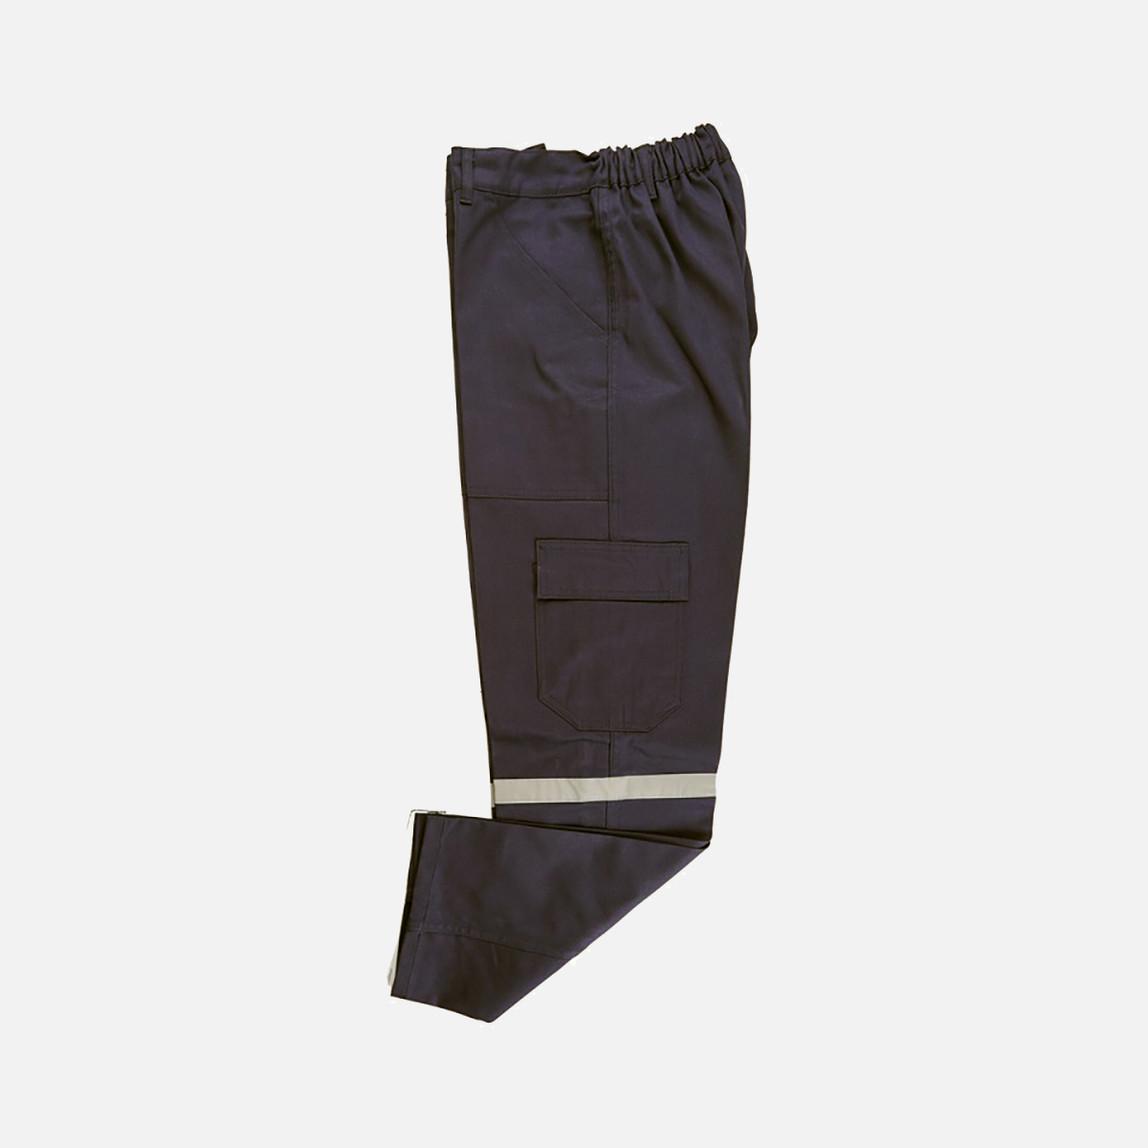 İş Pantolonu XL Beden Gri